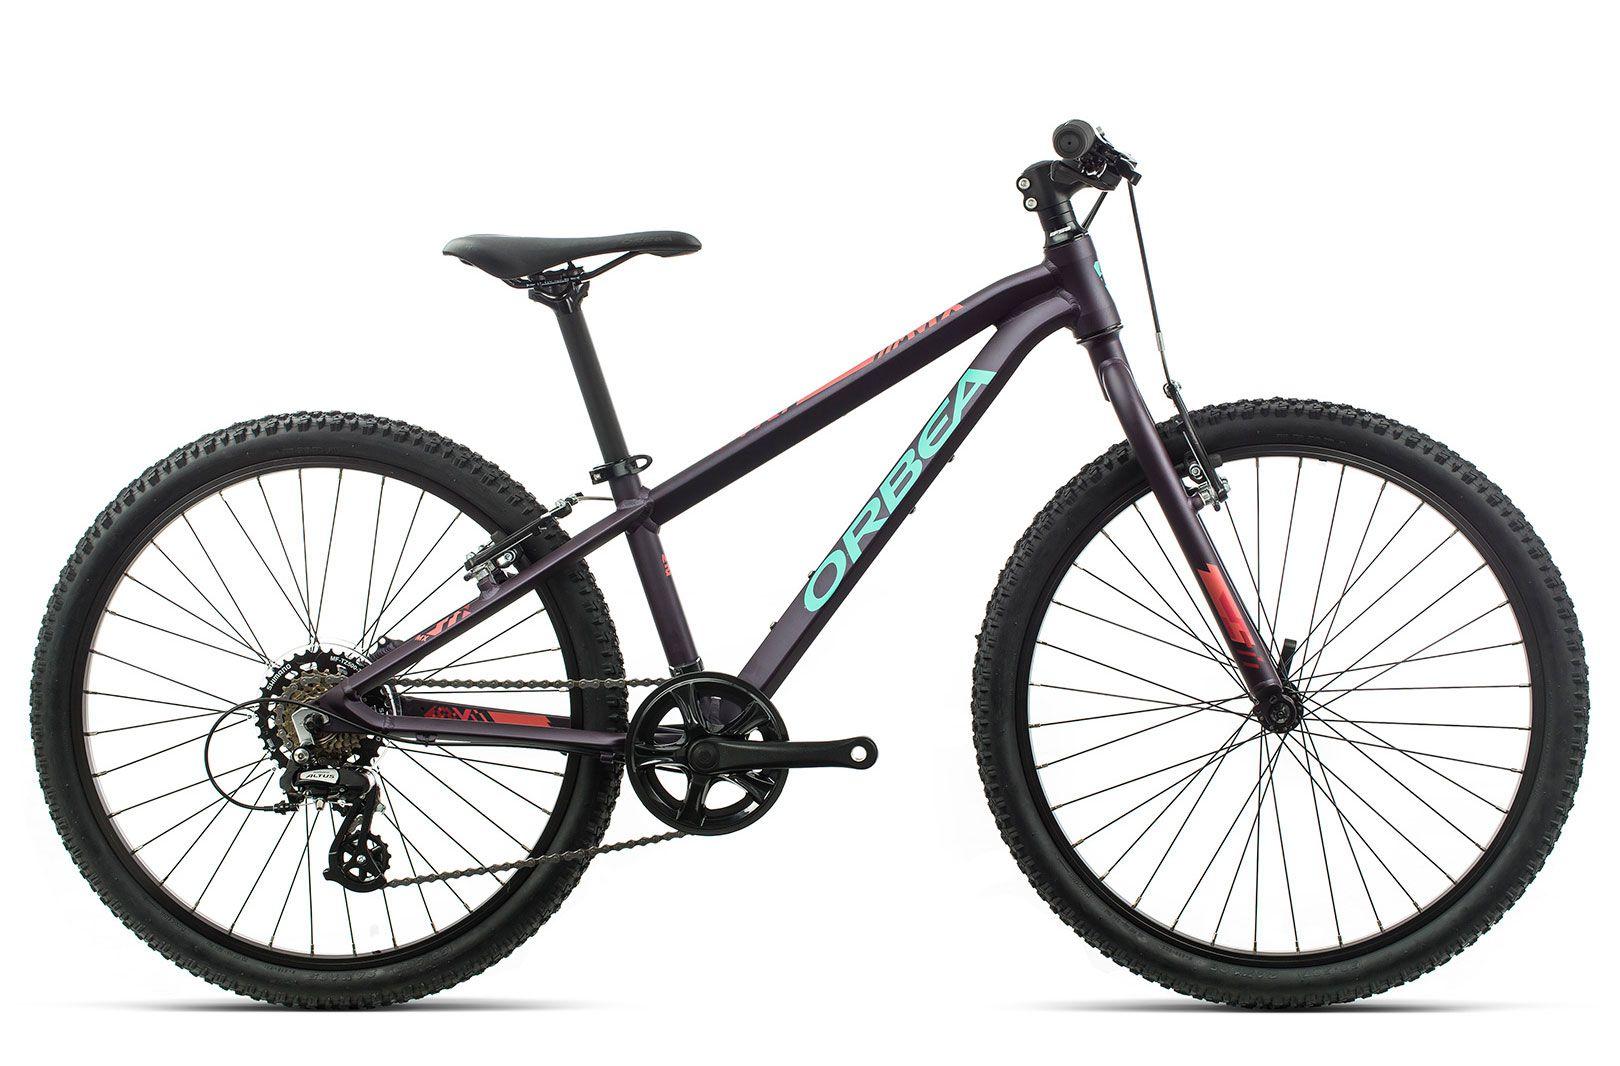 Bicicleta kids Orbea MX 24 DIRT - Púrpura-Rosa 2020